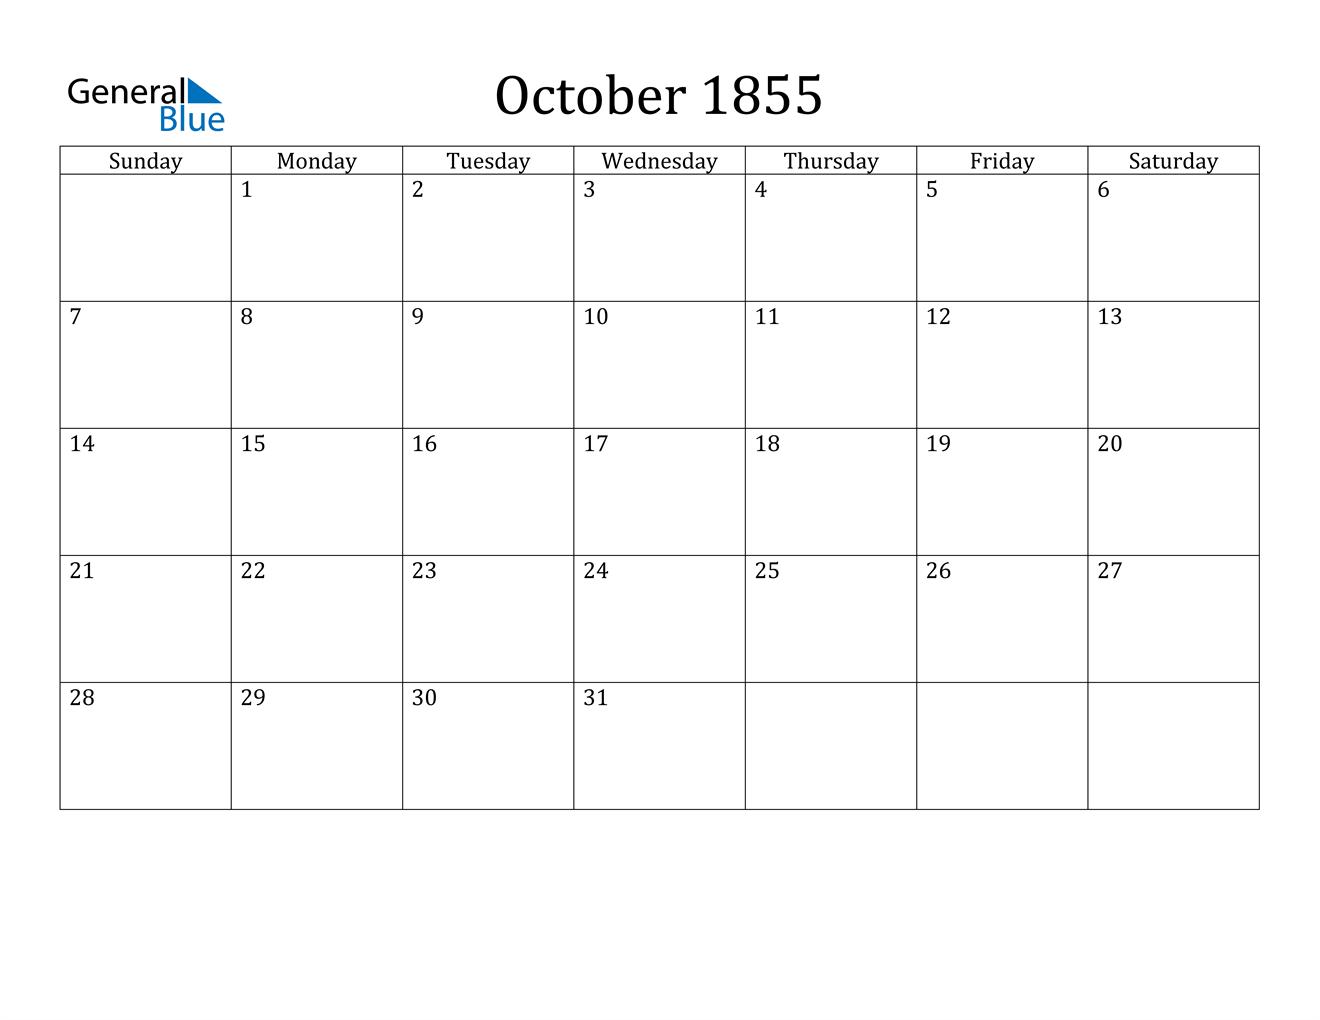 Image of October 1855 Calendar